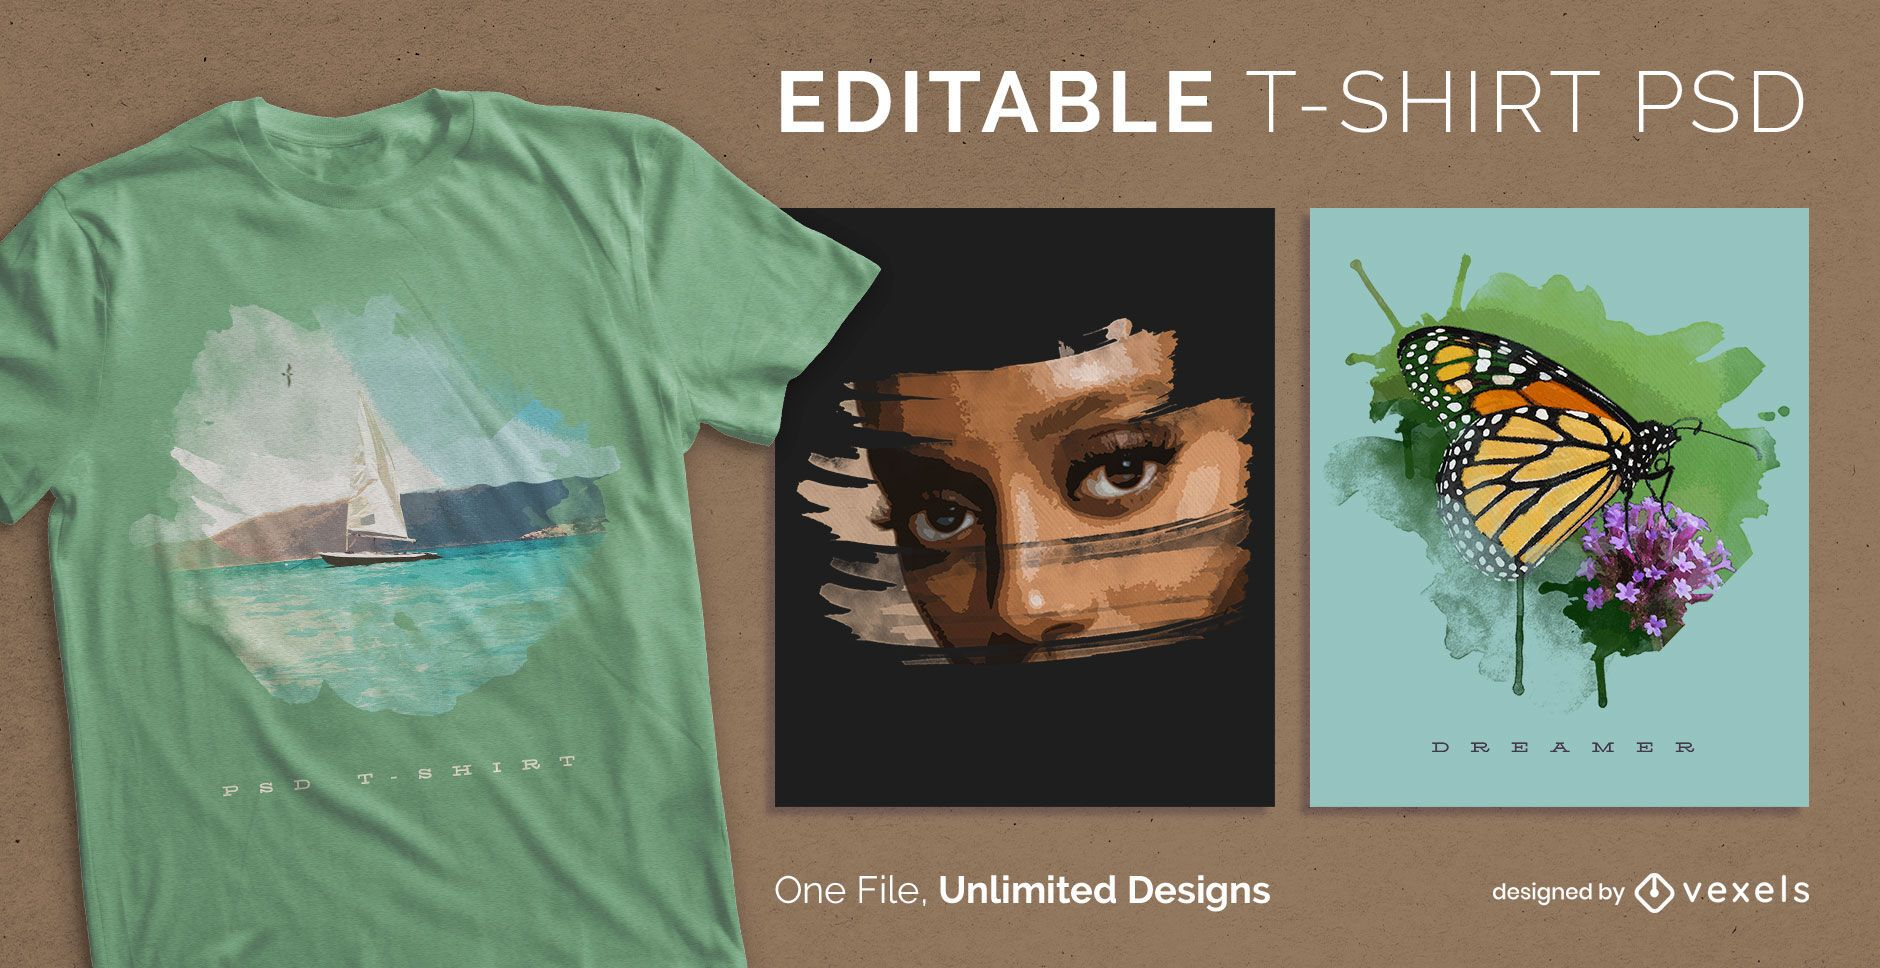 Aquarellkunst skalierbares T-Shirt PSD